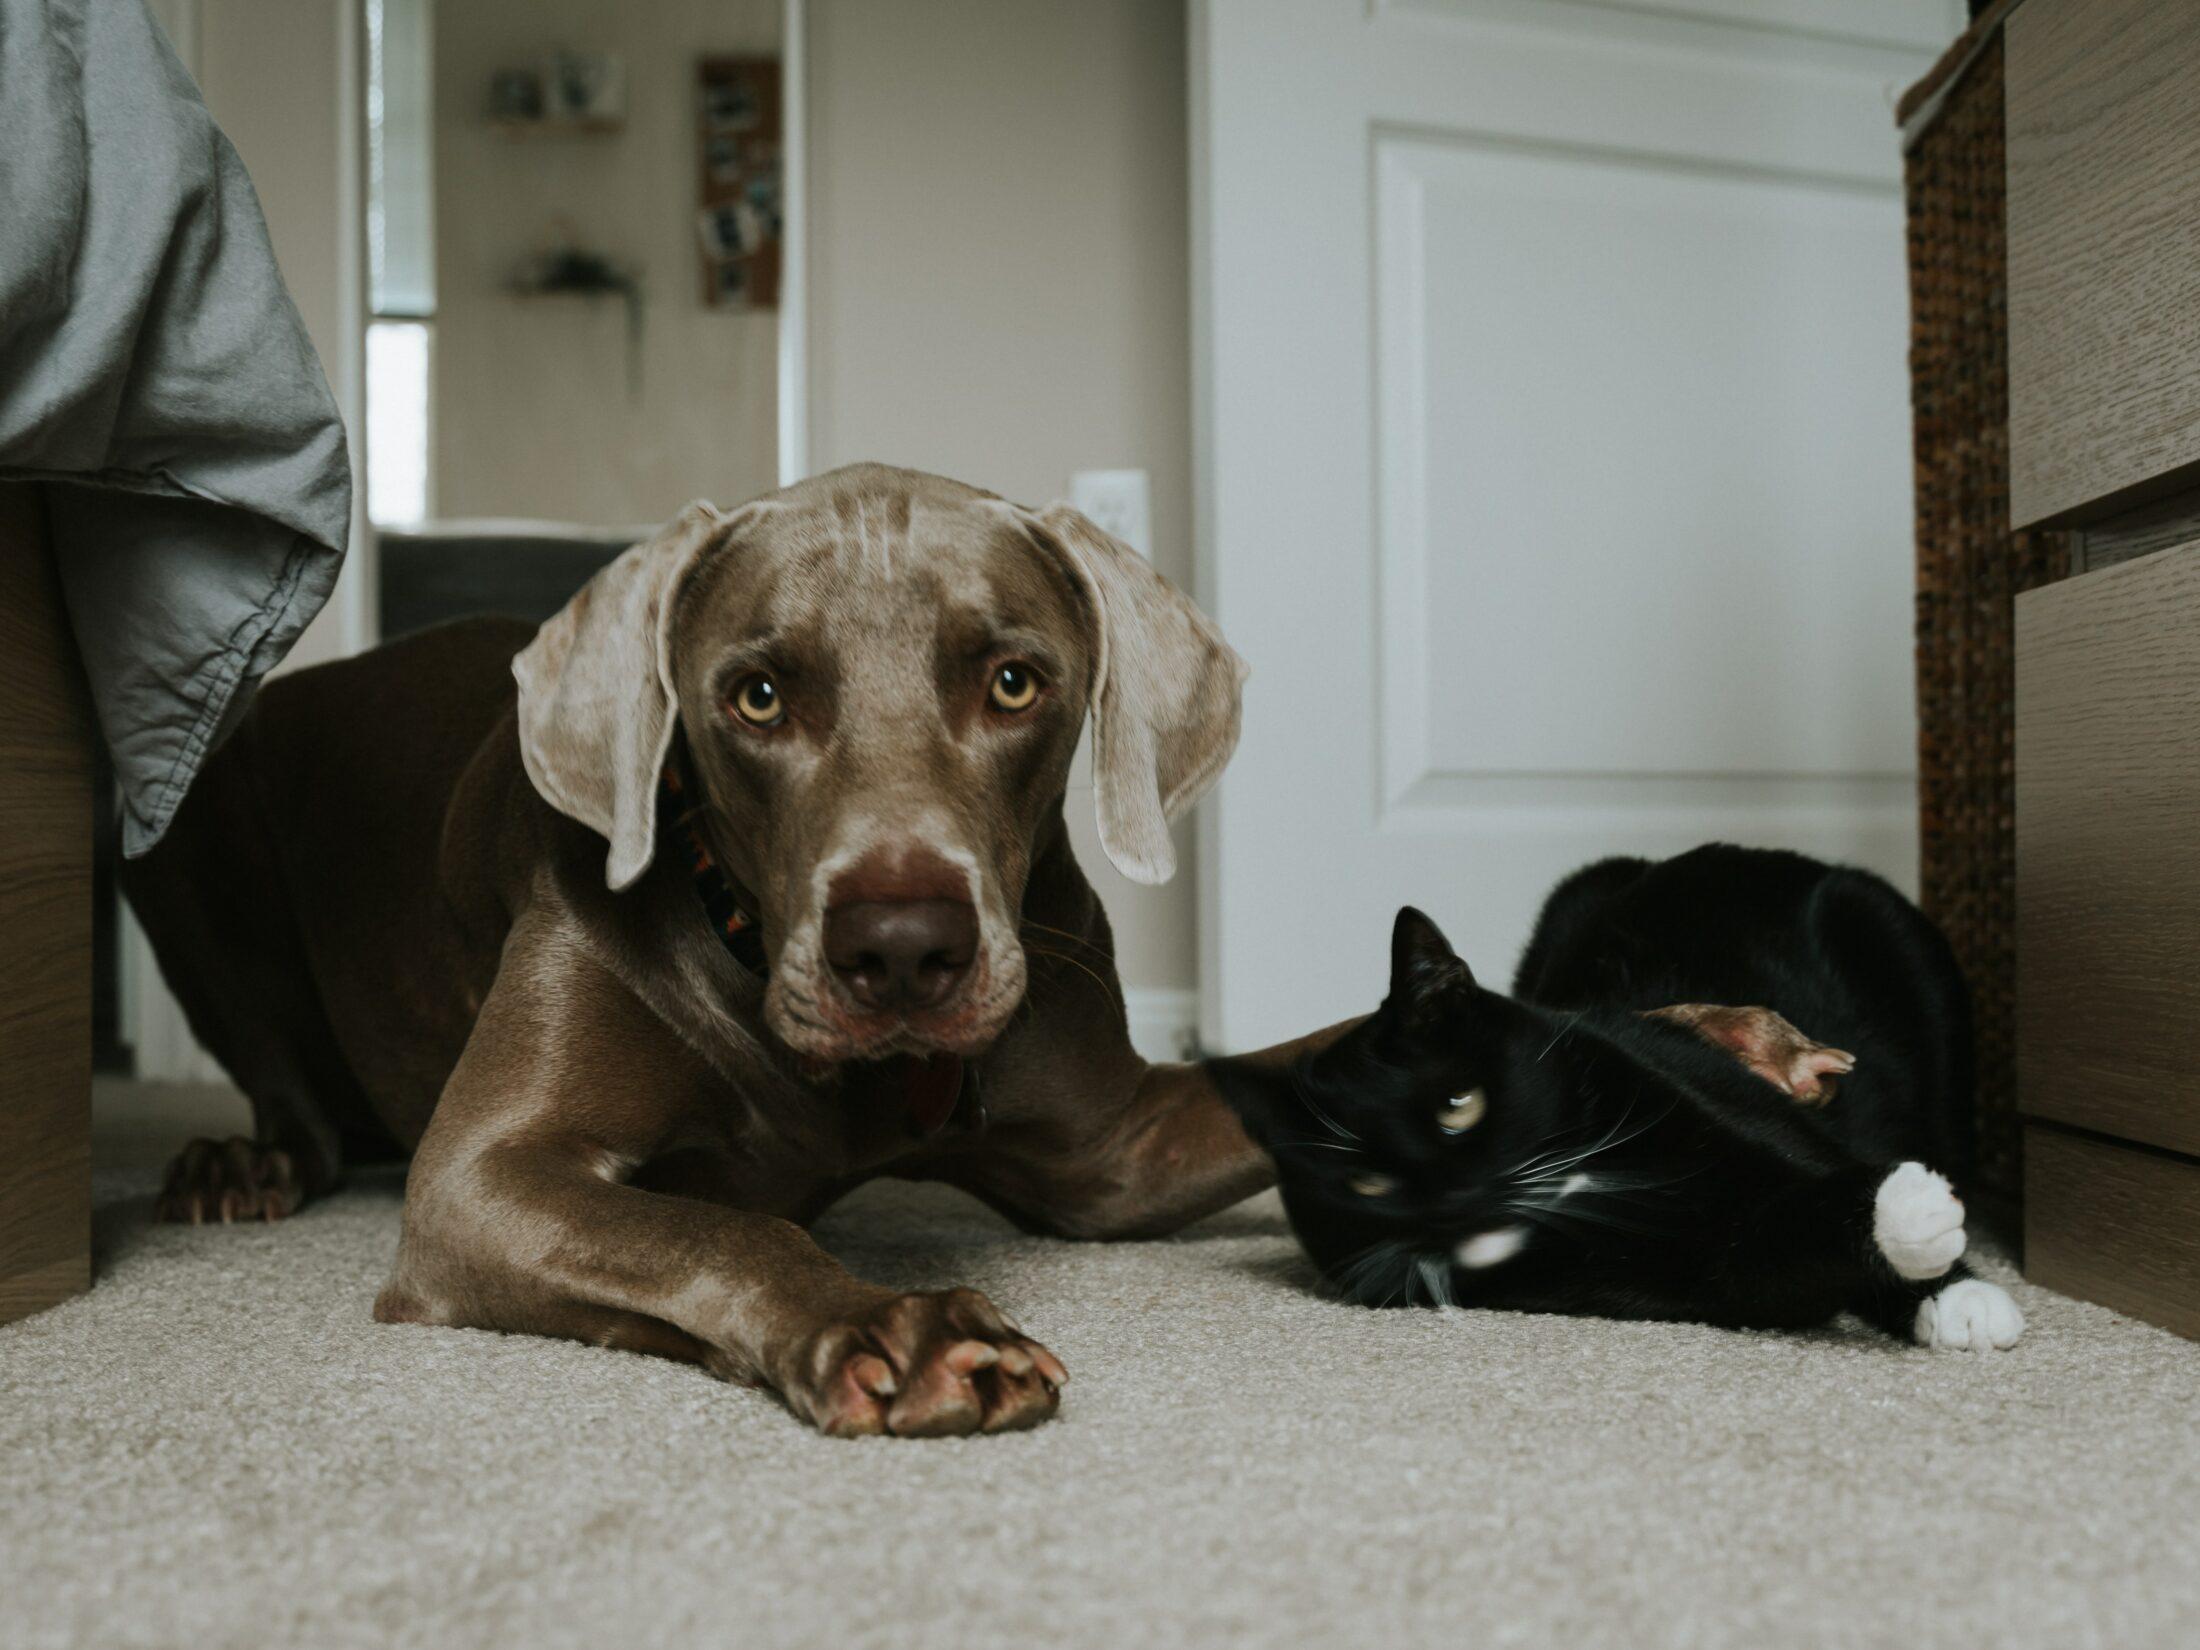 cachorro e gato juntos deitados no tapete